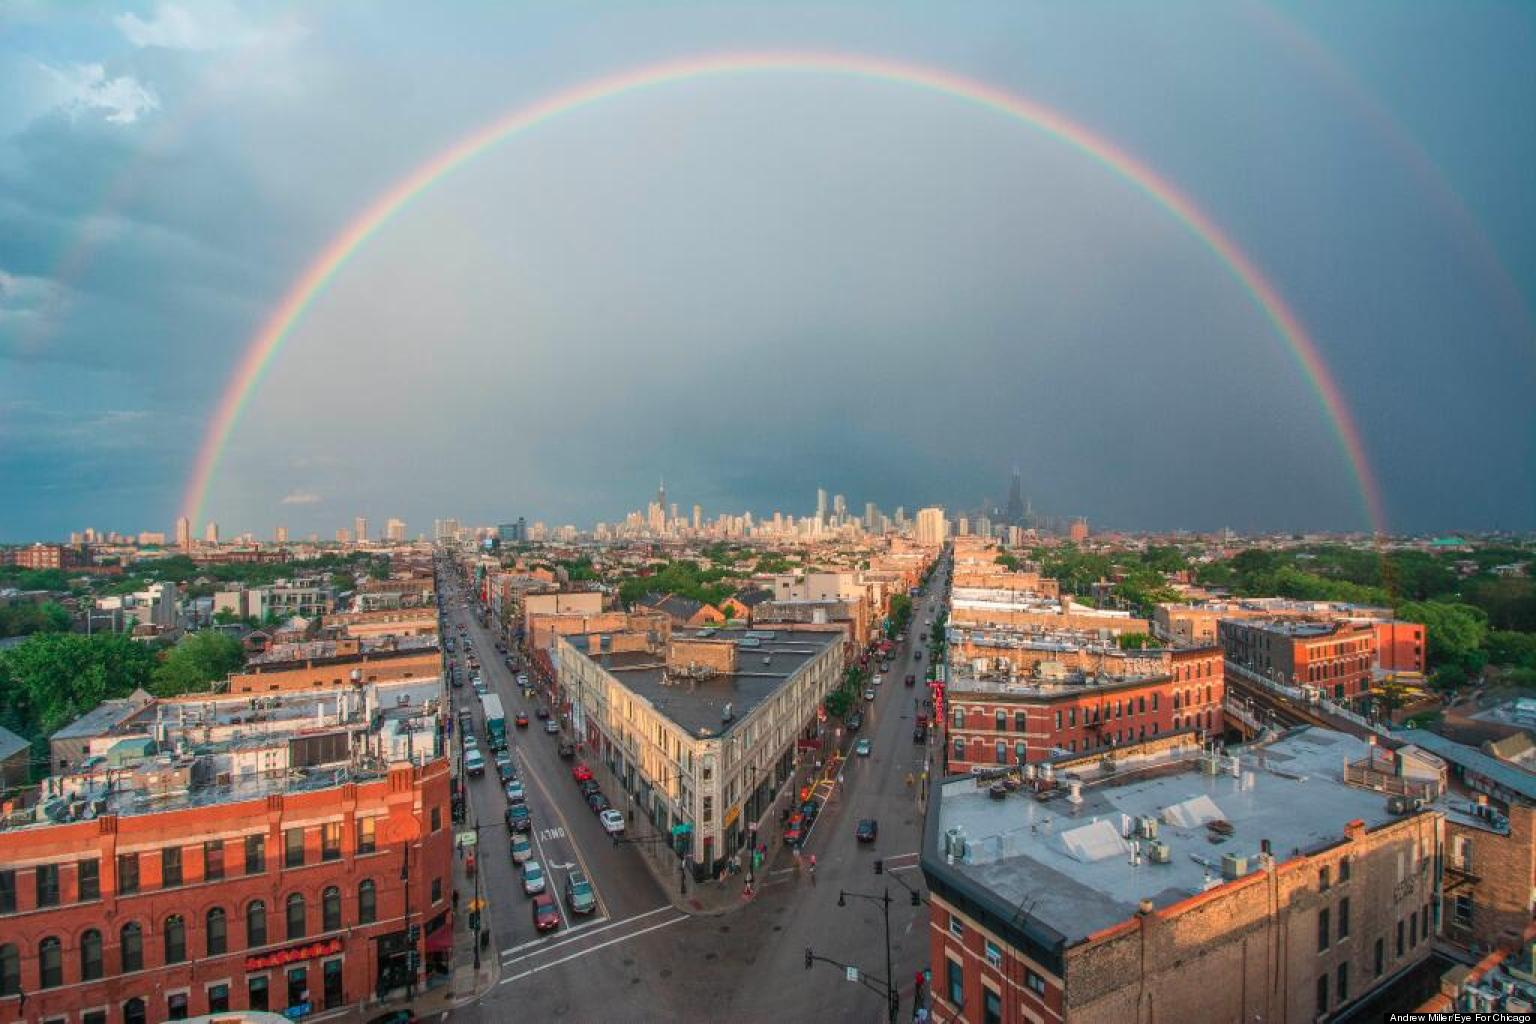 double rainbow chicago photographer captures amazing shot from